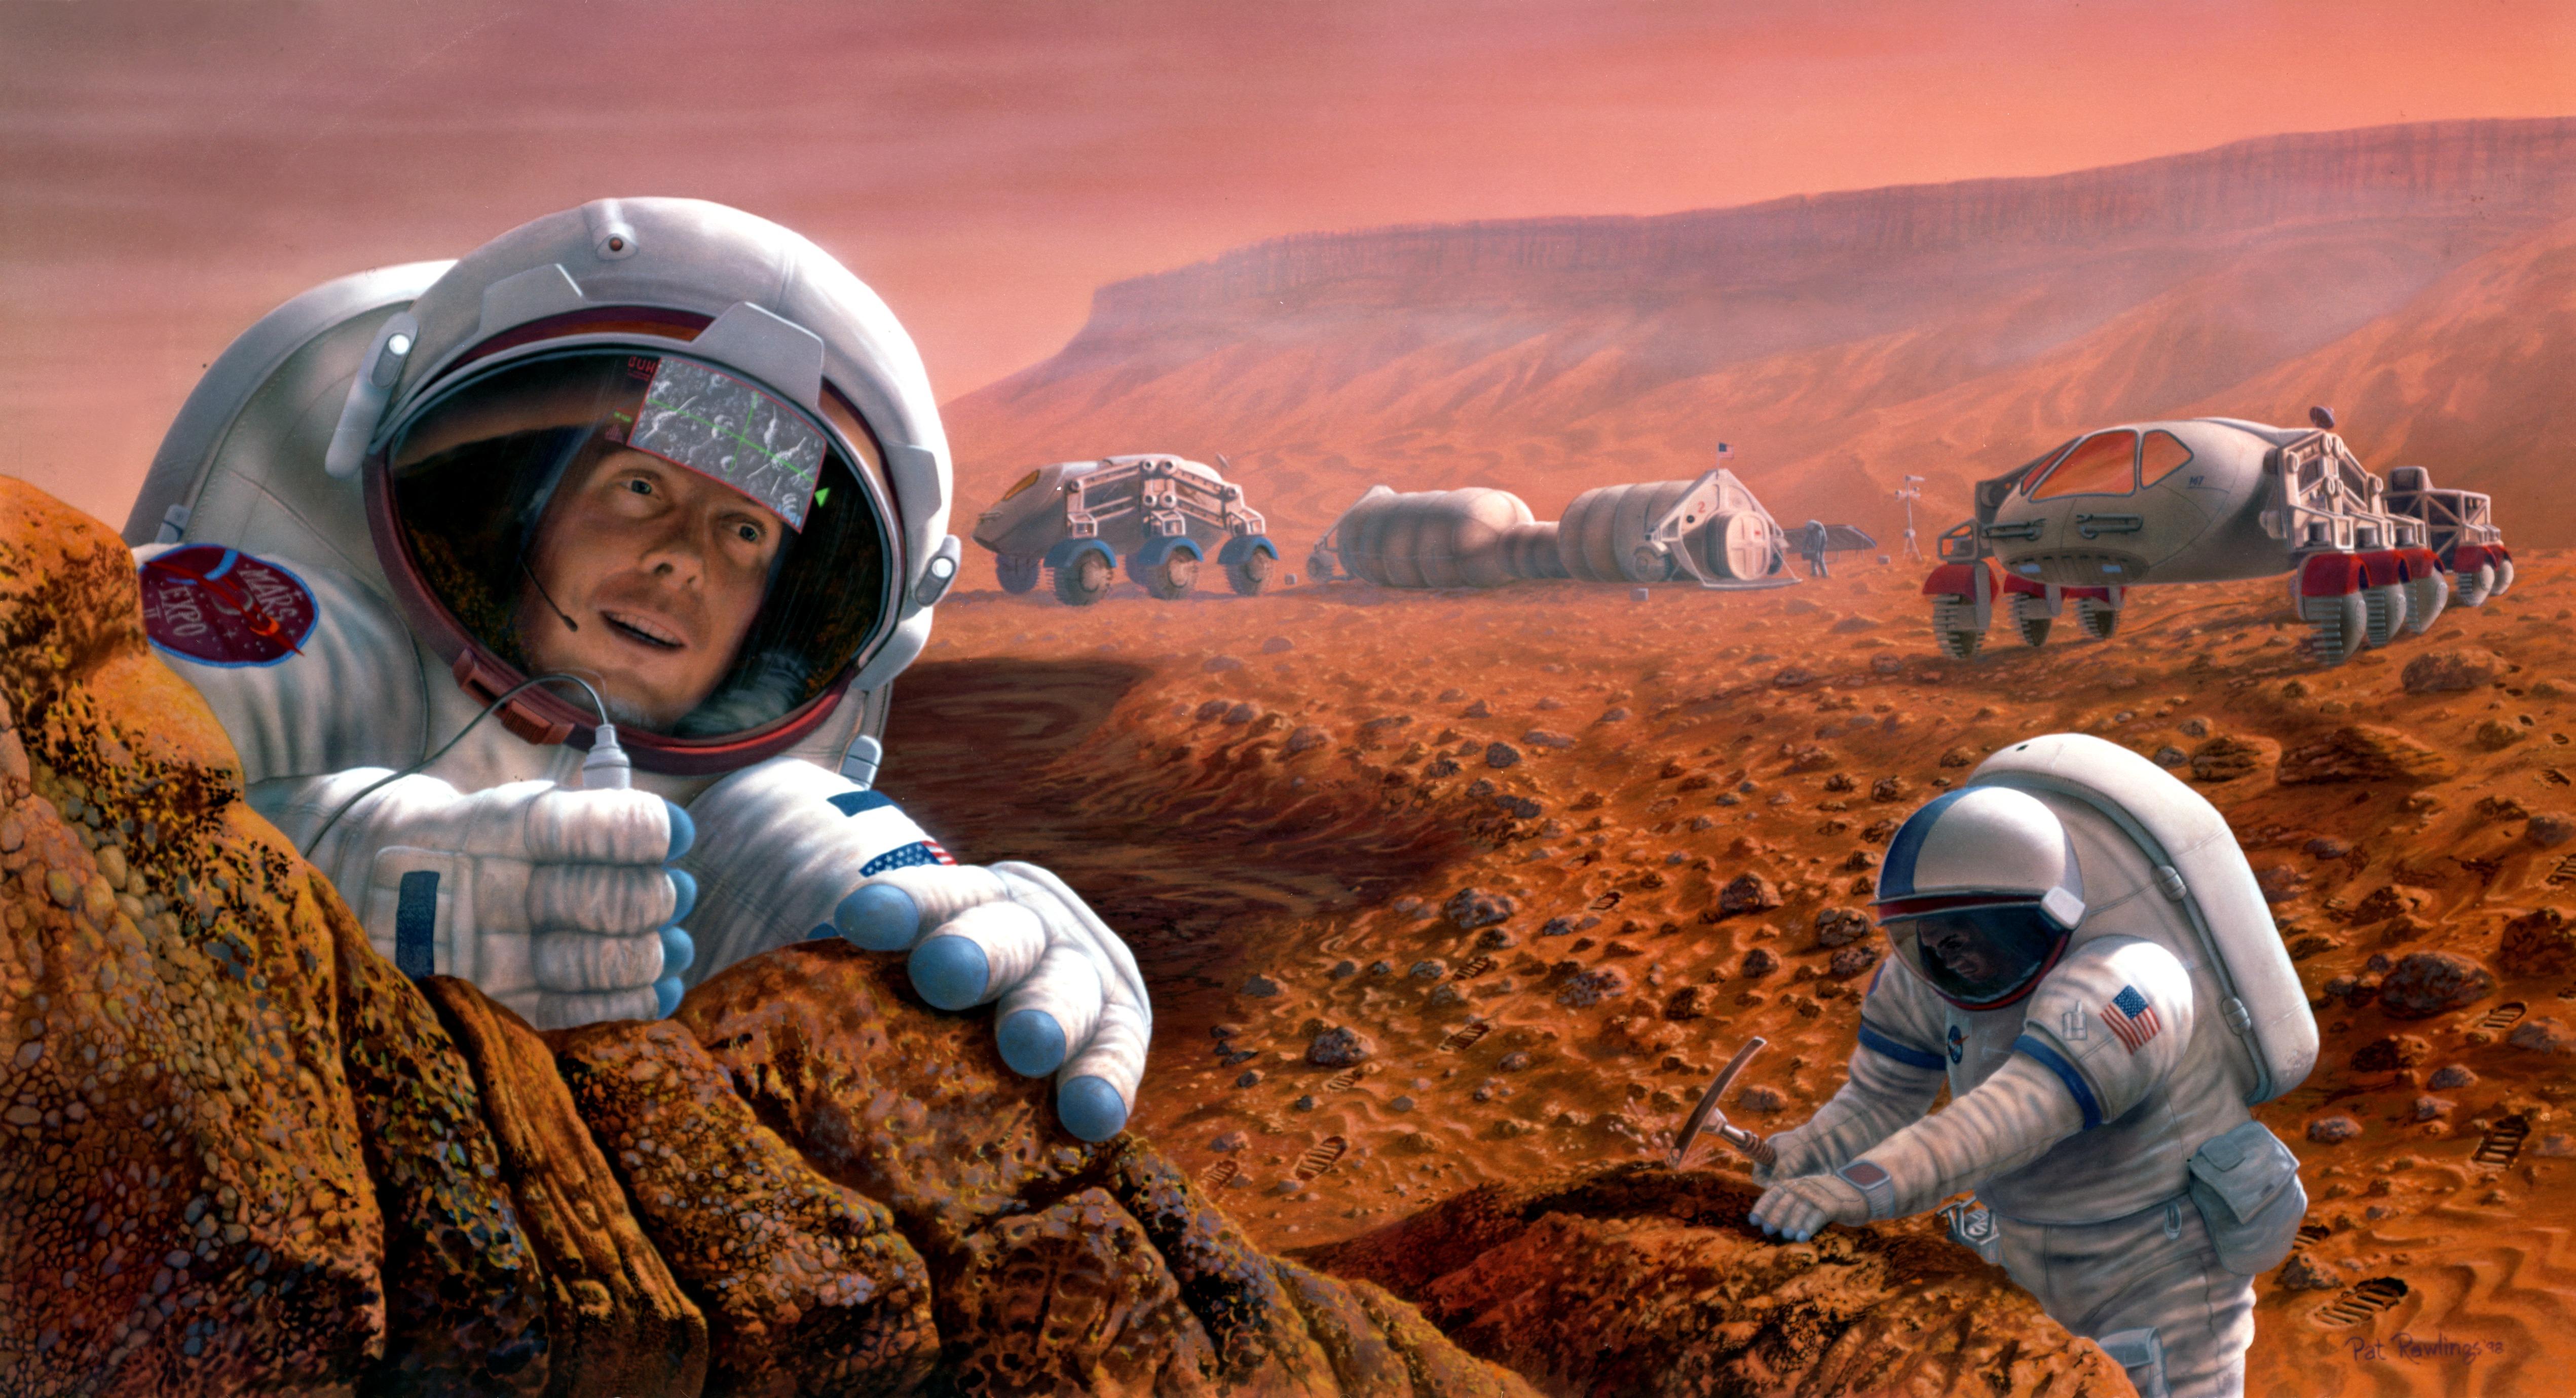 astronaut life in spaceship - photo #39